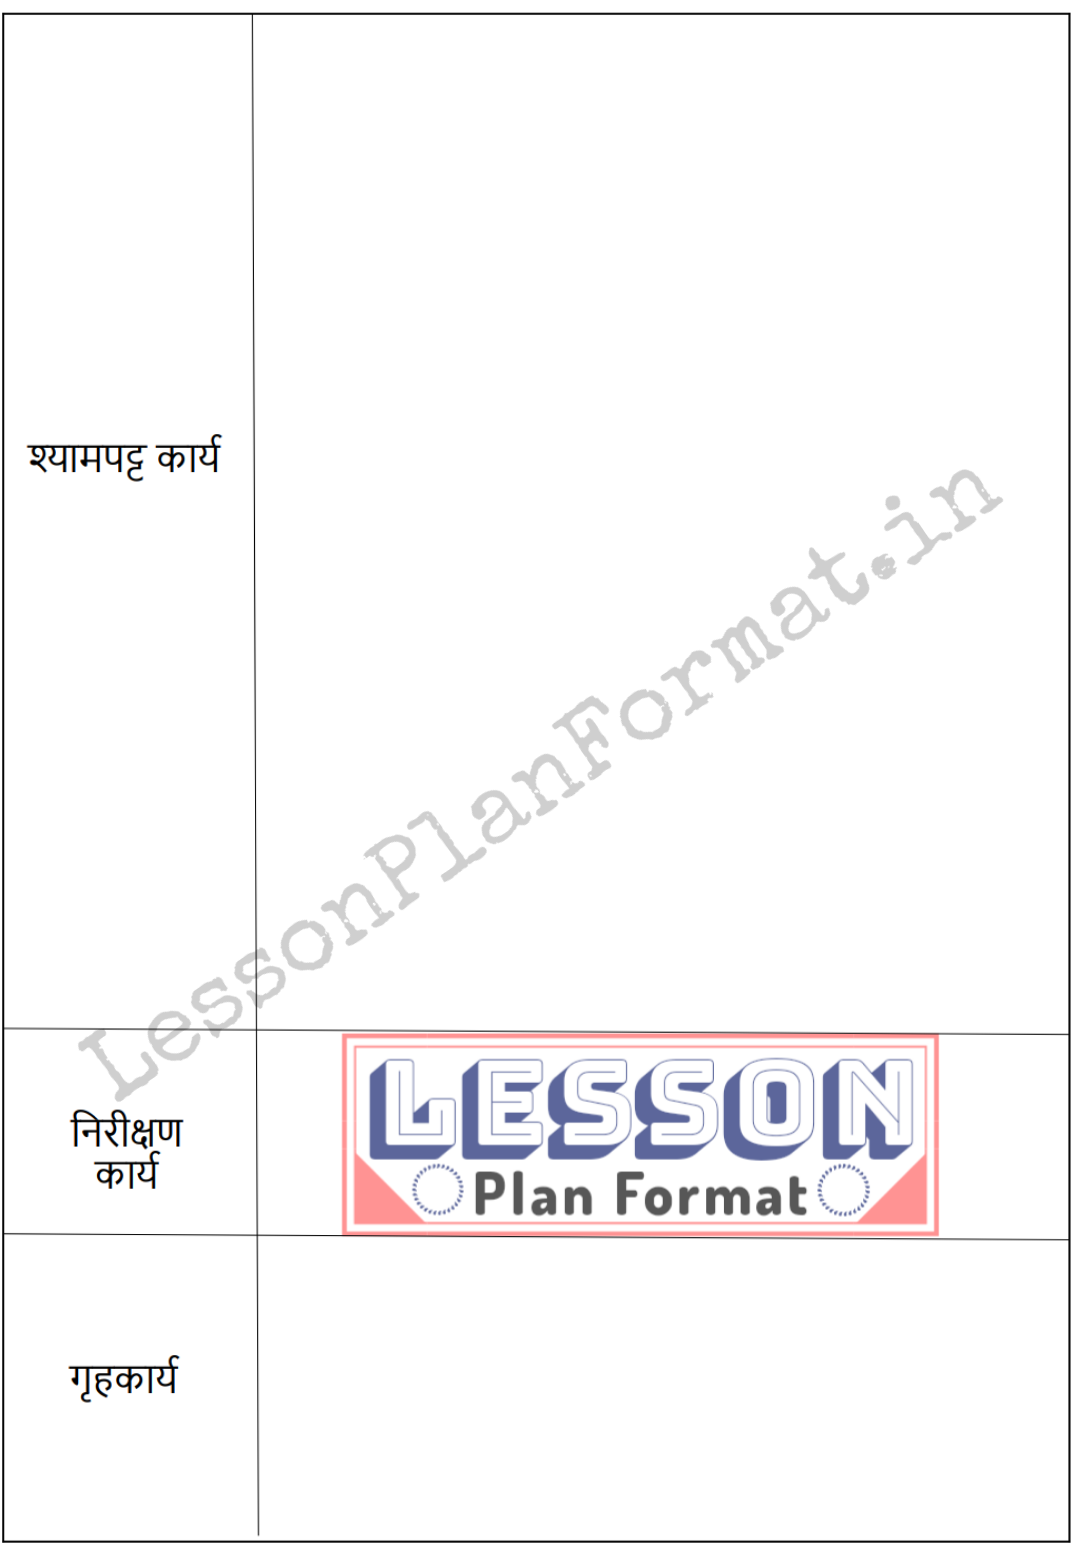 LessonPlanFormat in hindi